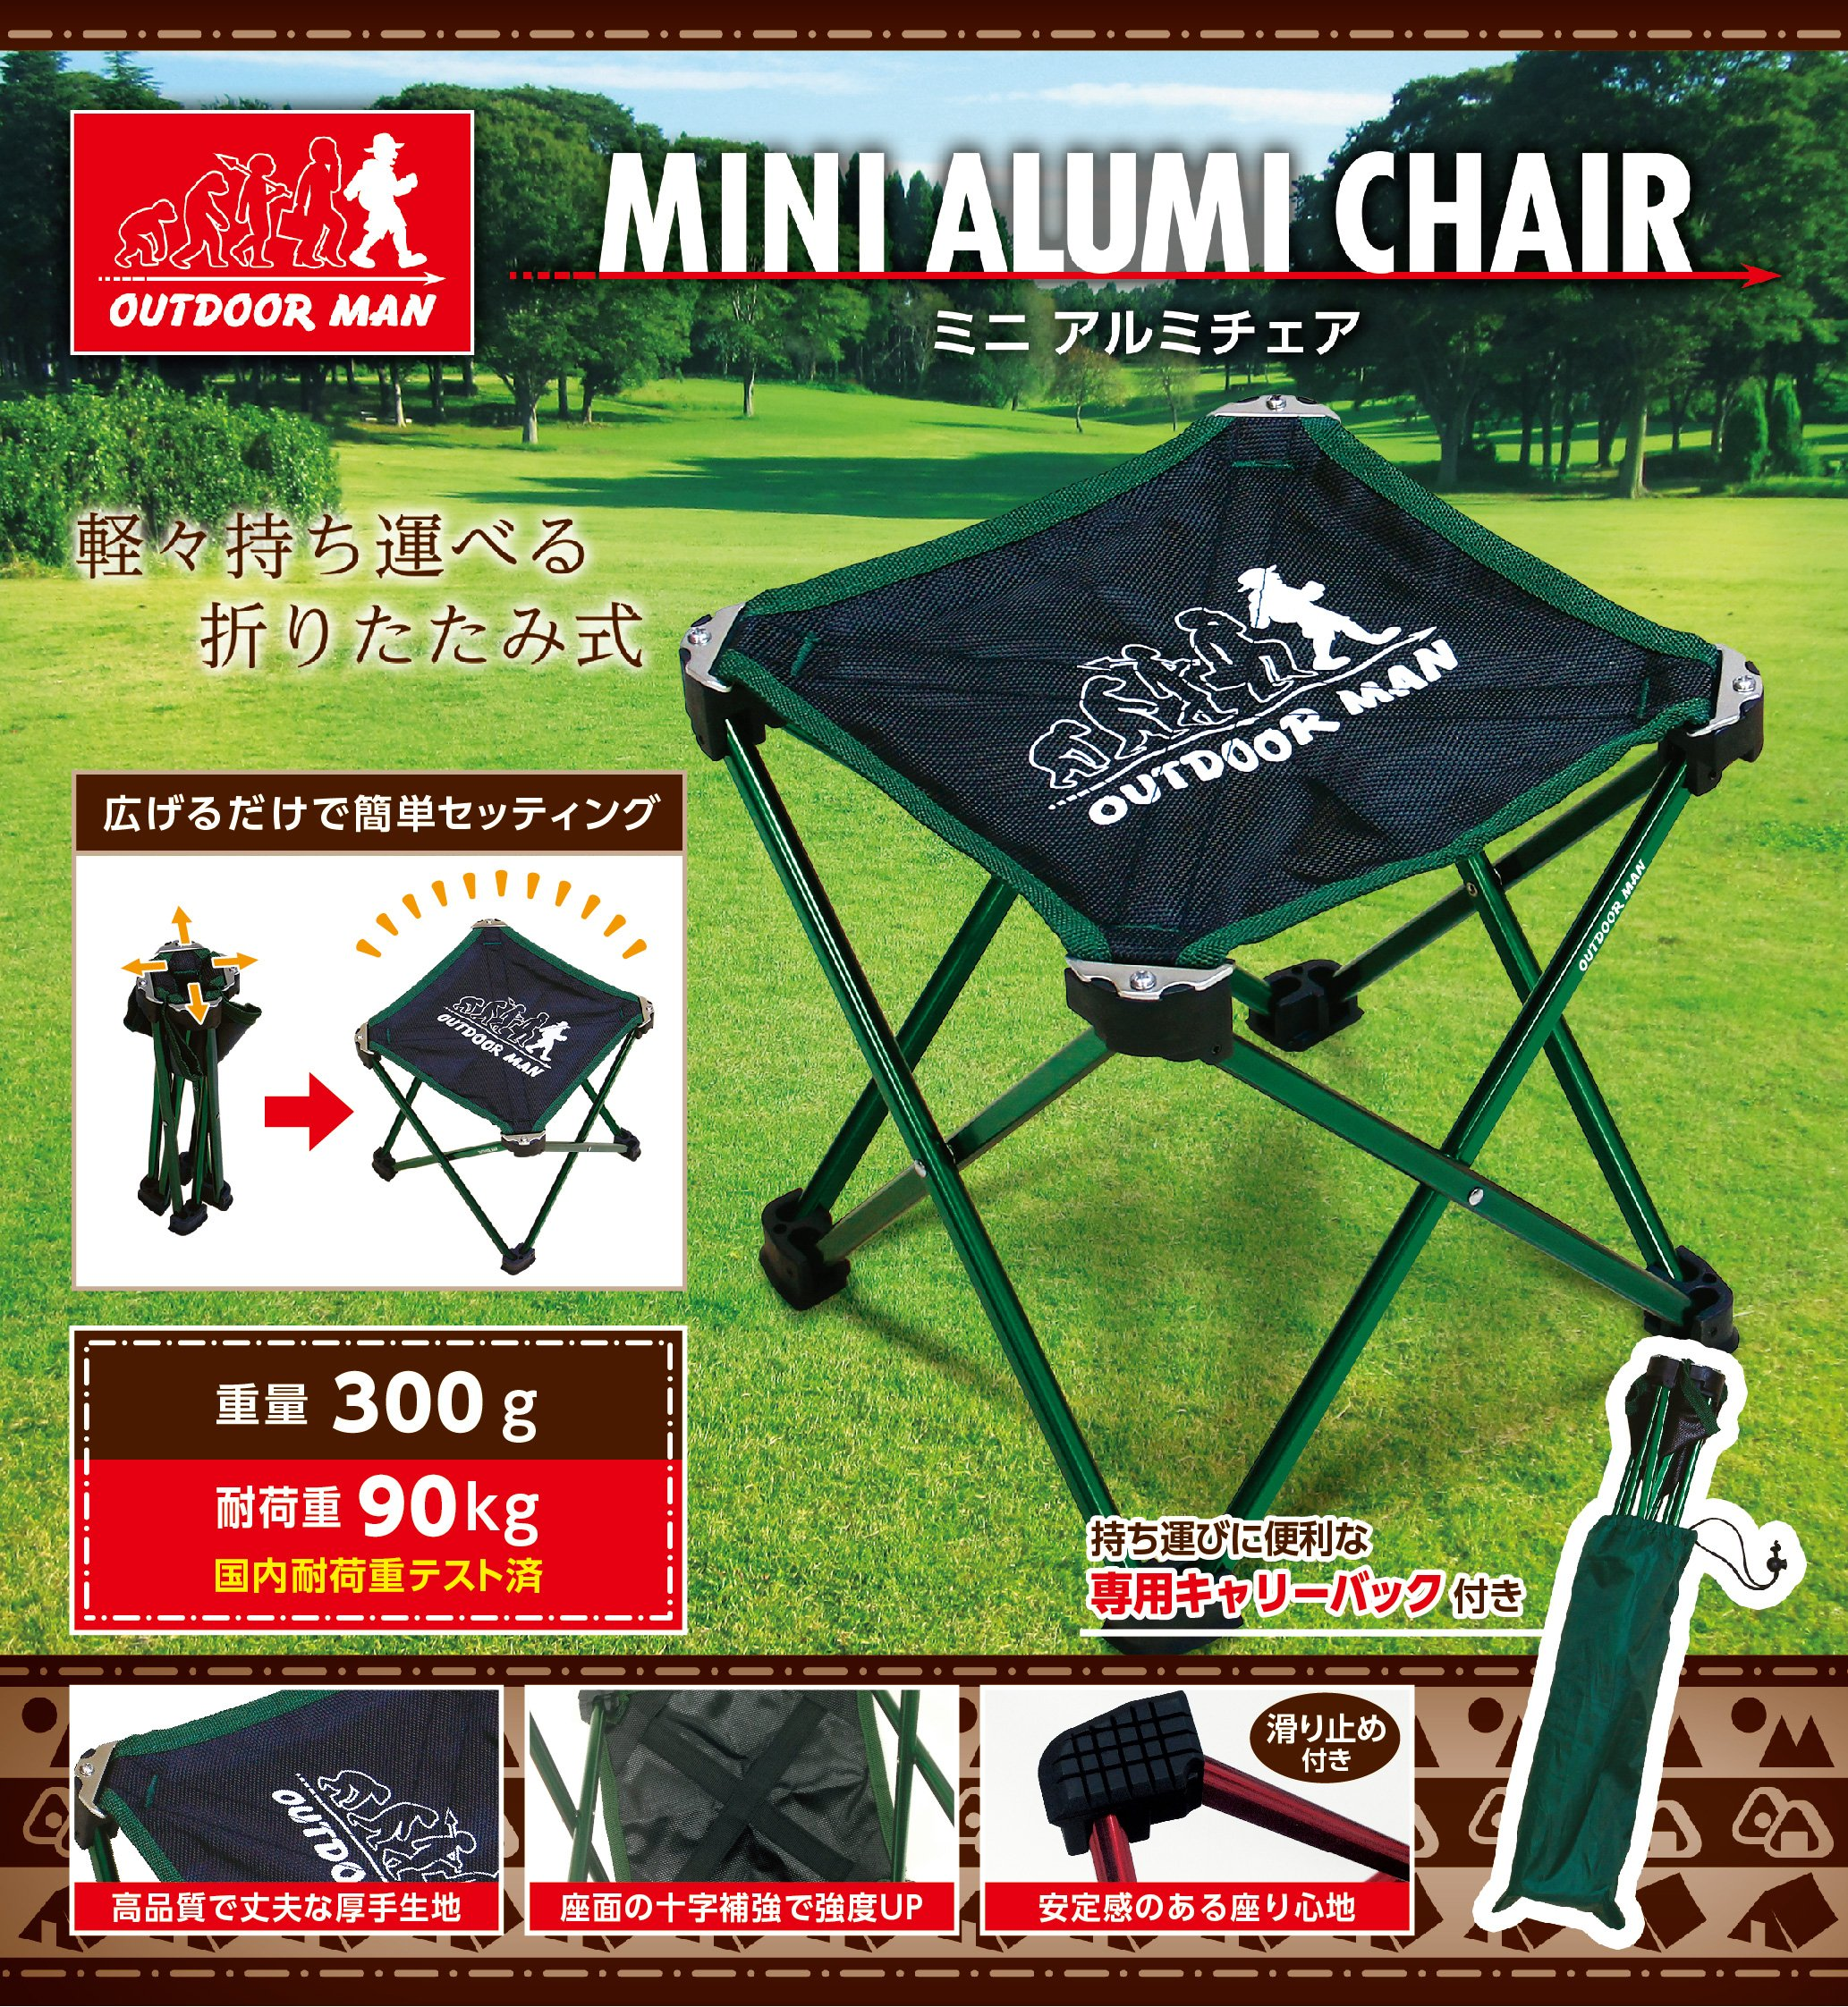 MU Sports Peanut Club Outdoor Man Mini Aluminum Chair Green Golf Wear/Women's Vest/Women's Complete Sets/Golf-Club-Complete-Sets by MU Sports (Image #1)